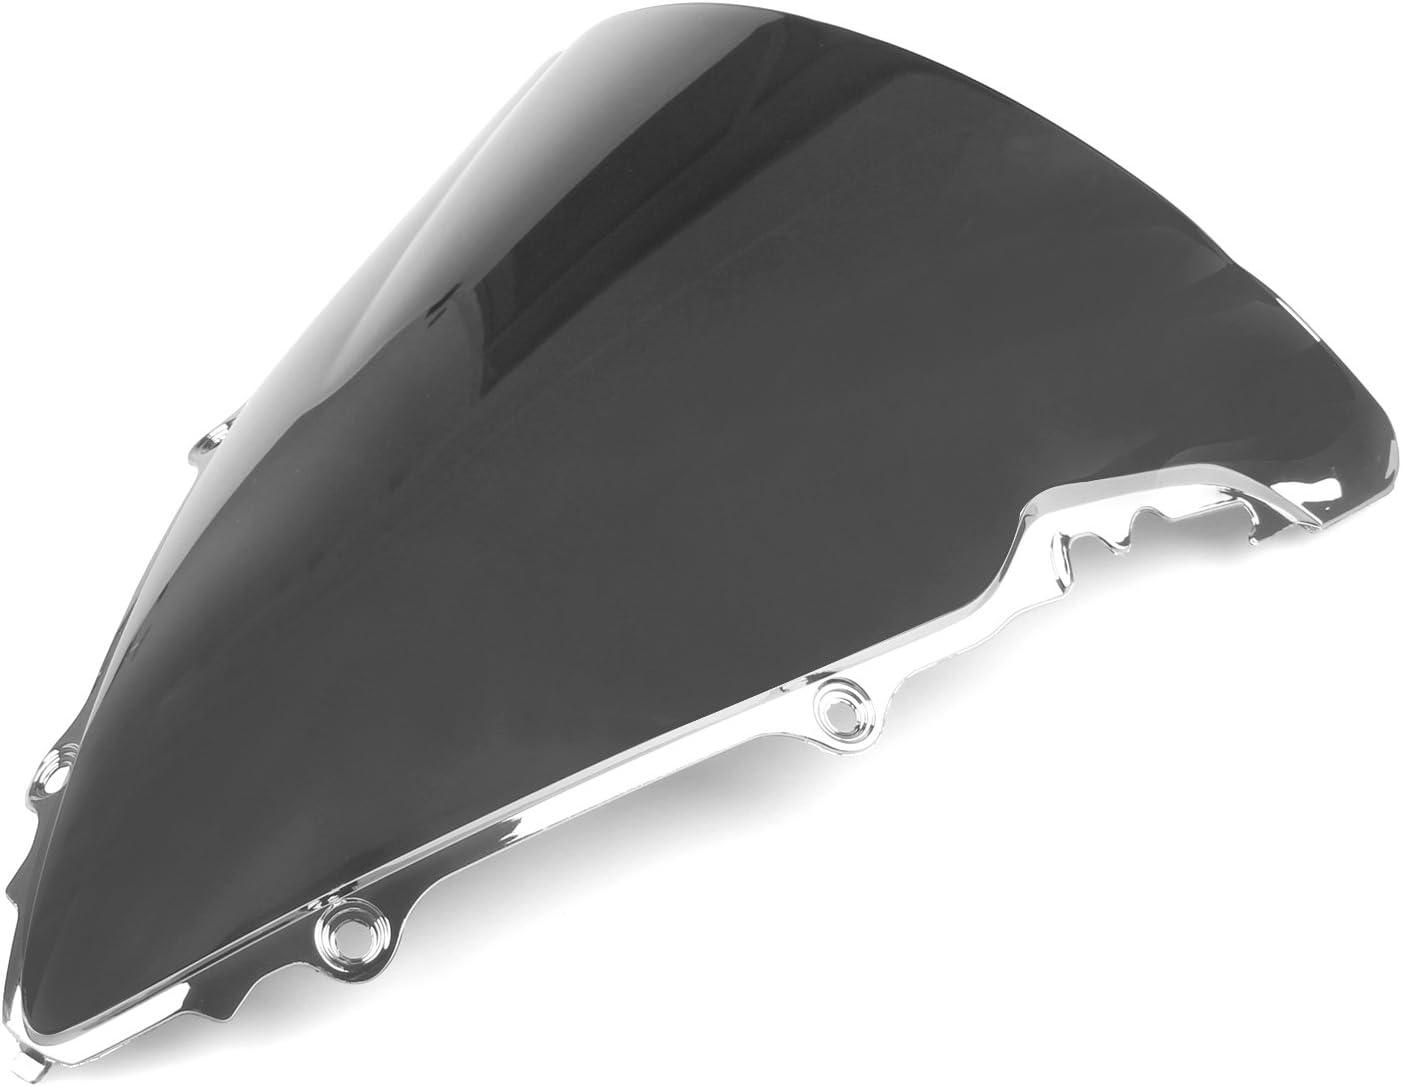 Motorcycle Wind Shield Protector Windscreen for Yamaha YZF R6 2003-2005 R6S 2006-2009 Artudatech Motorbike Windshield